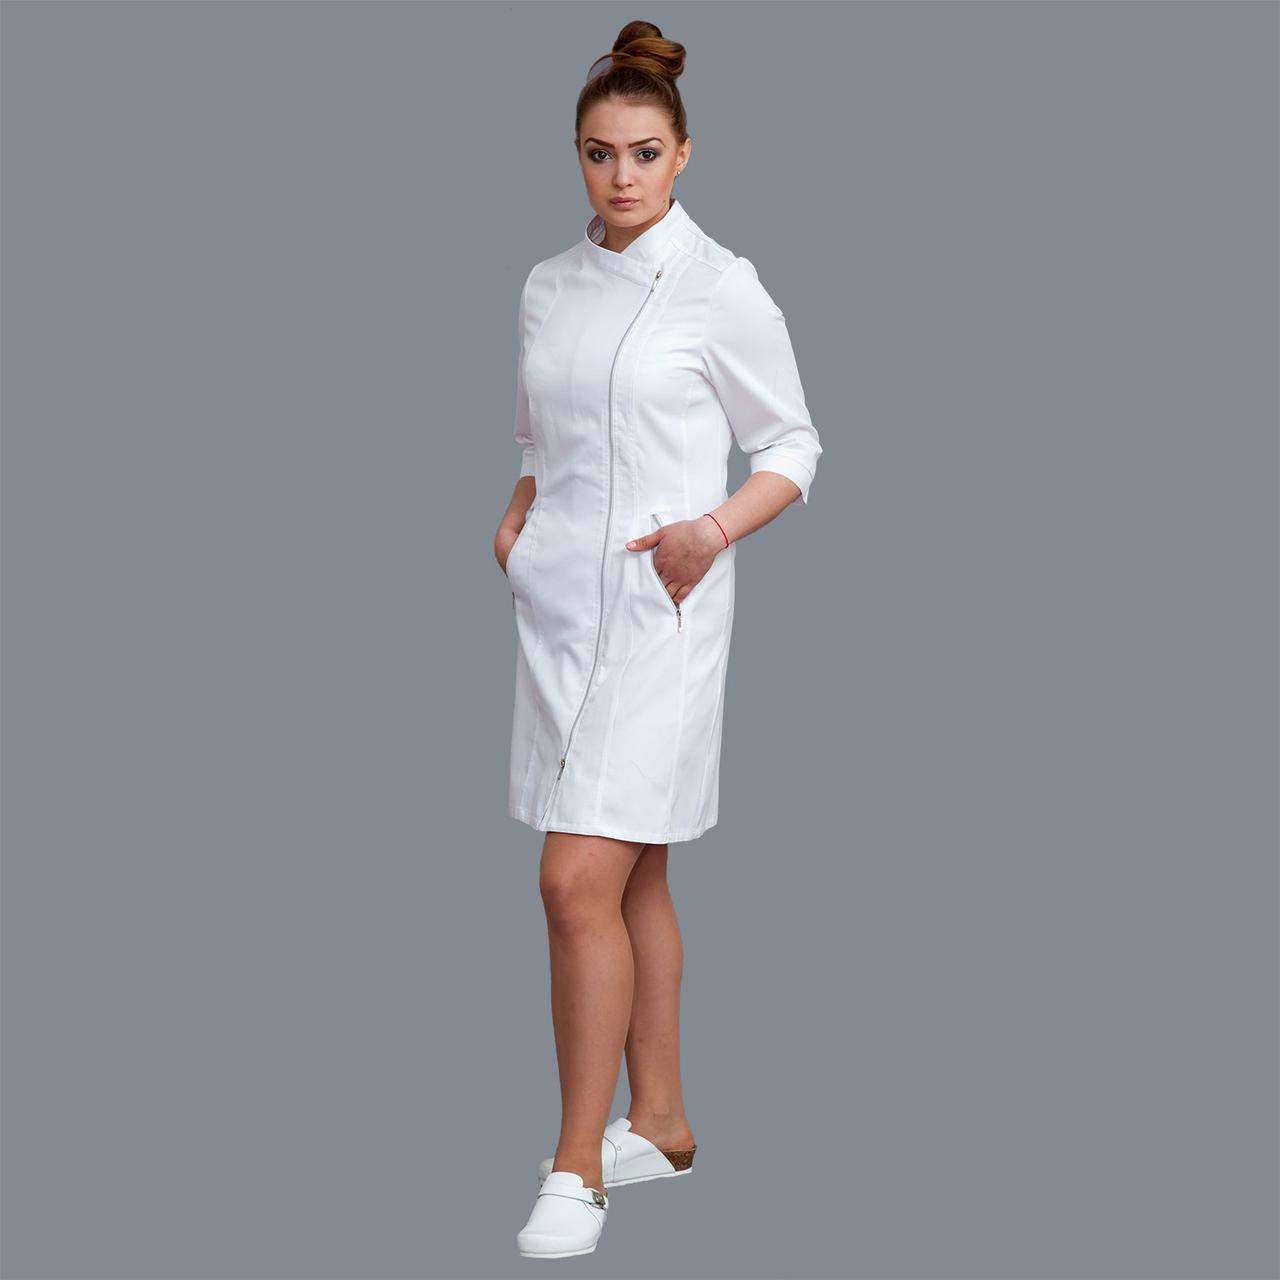 Медицинский женский халат Шери р.44